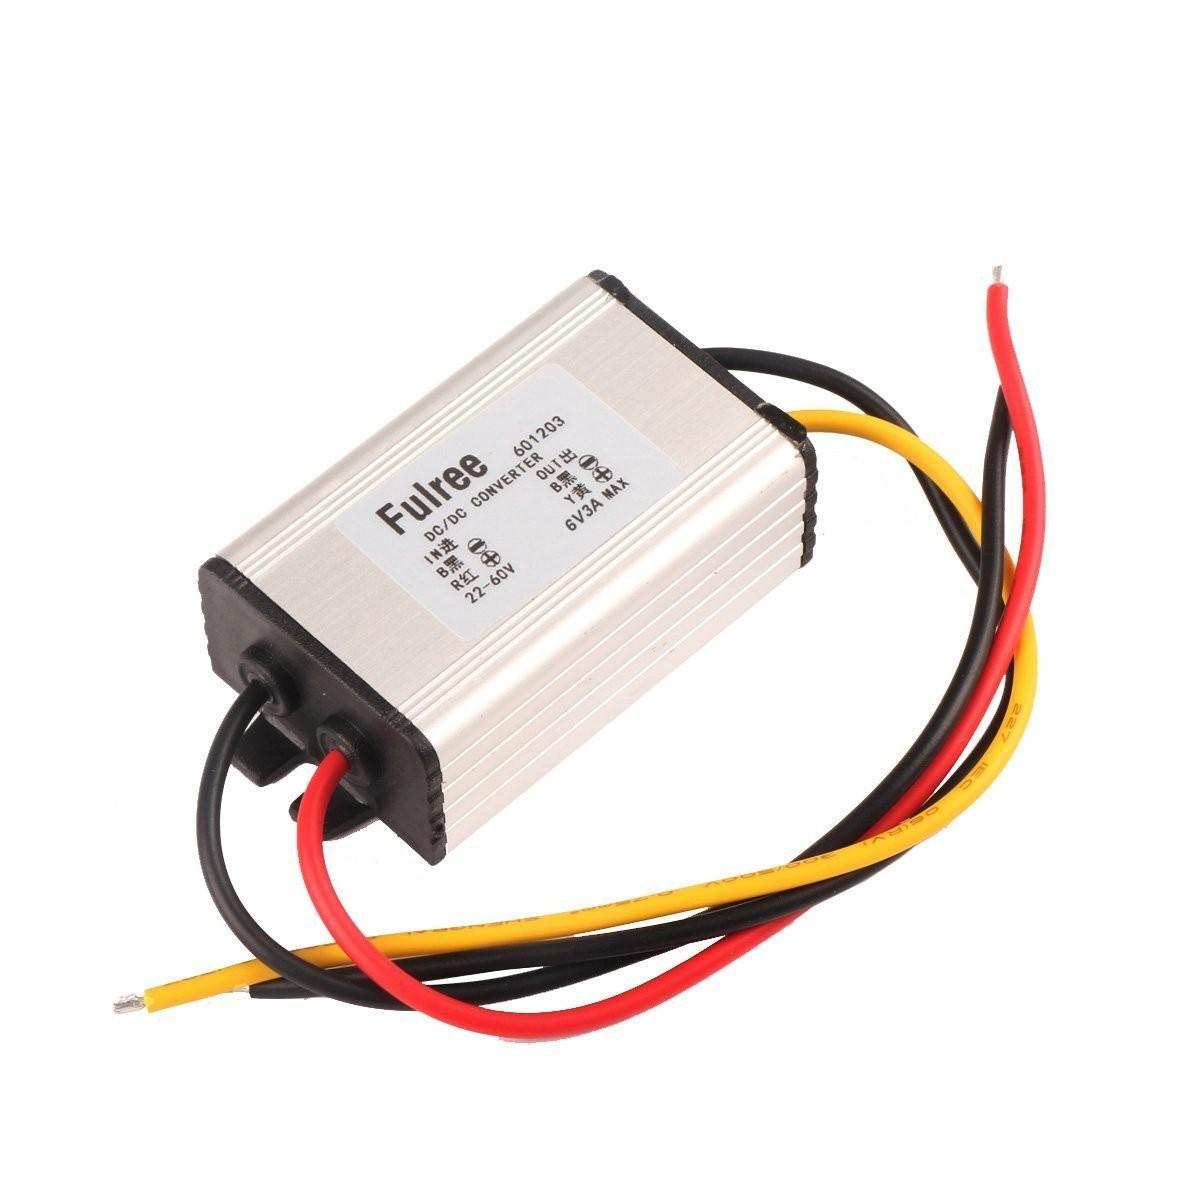 Riorand Dc To Buck Voltage Converter 22 60v 24v 36v 48v 6v 3a Wiring 12v Accessories System Zoom